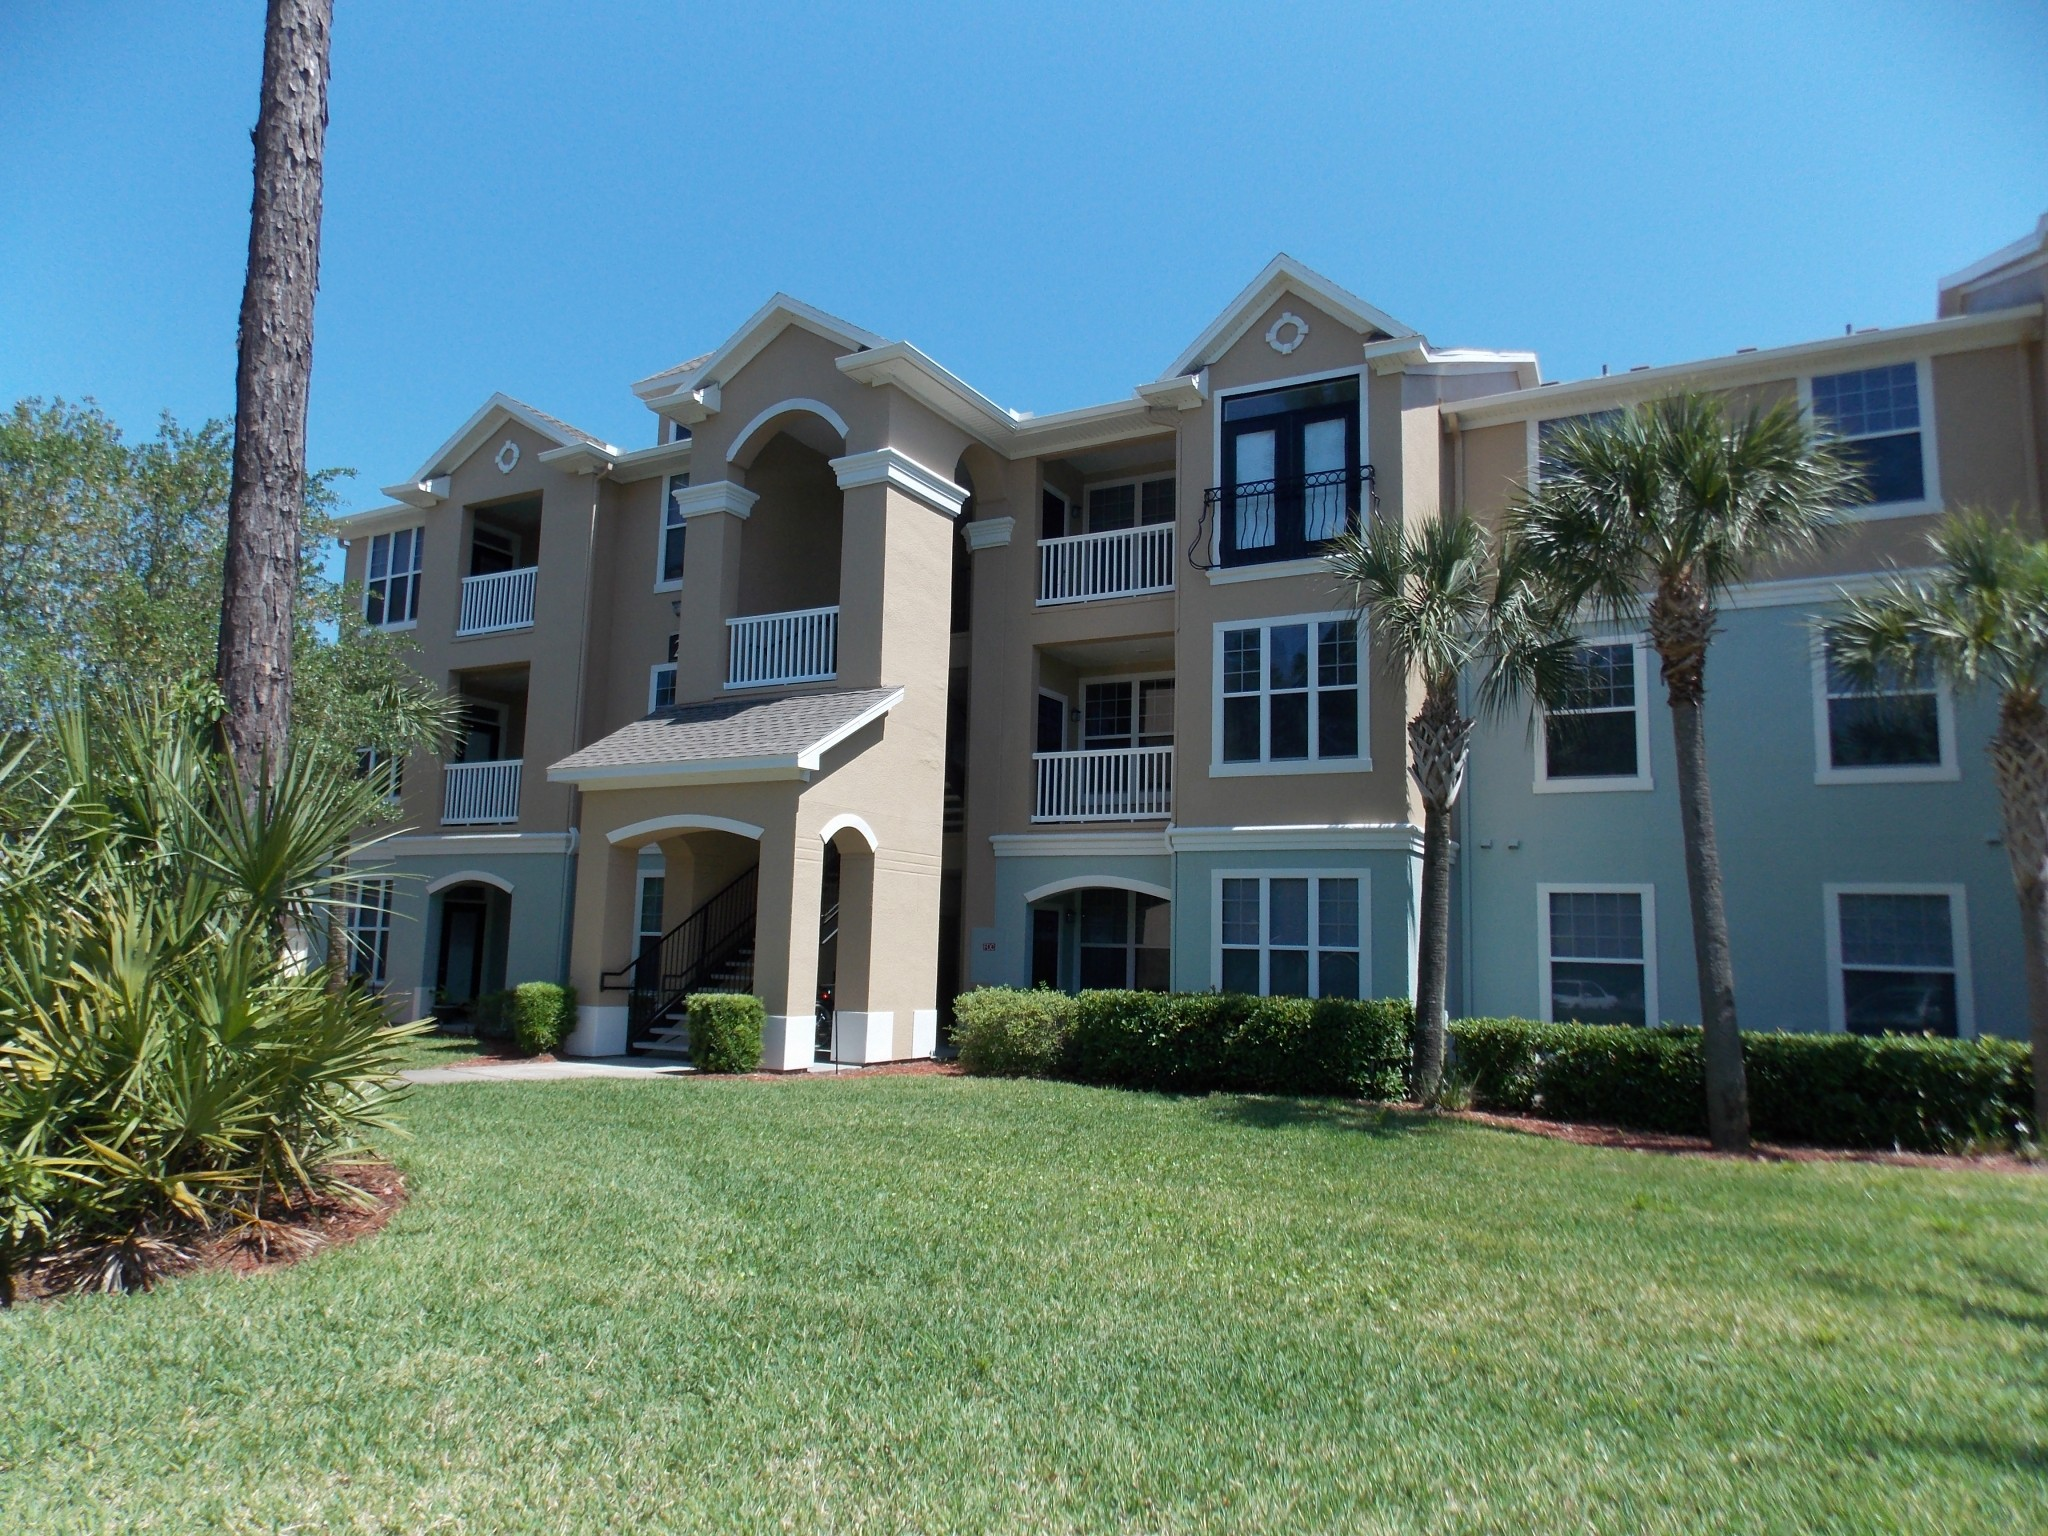 432 Ashcroft Landing Dr Jacksonville Fl 32225 3 Bedroom Apartment For Rent Padmapper